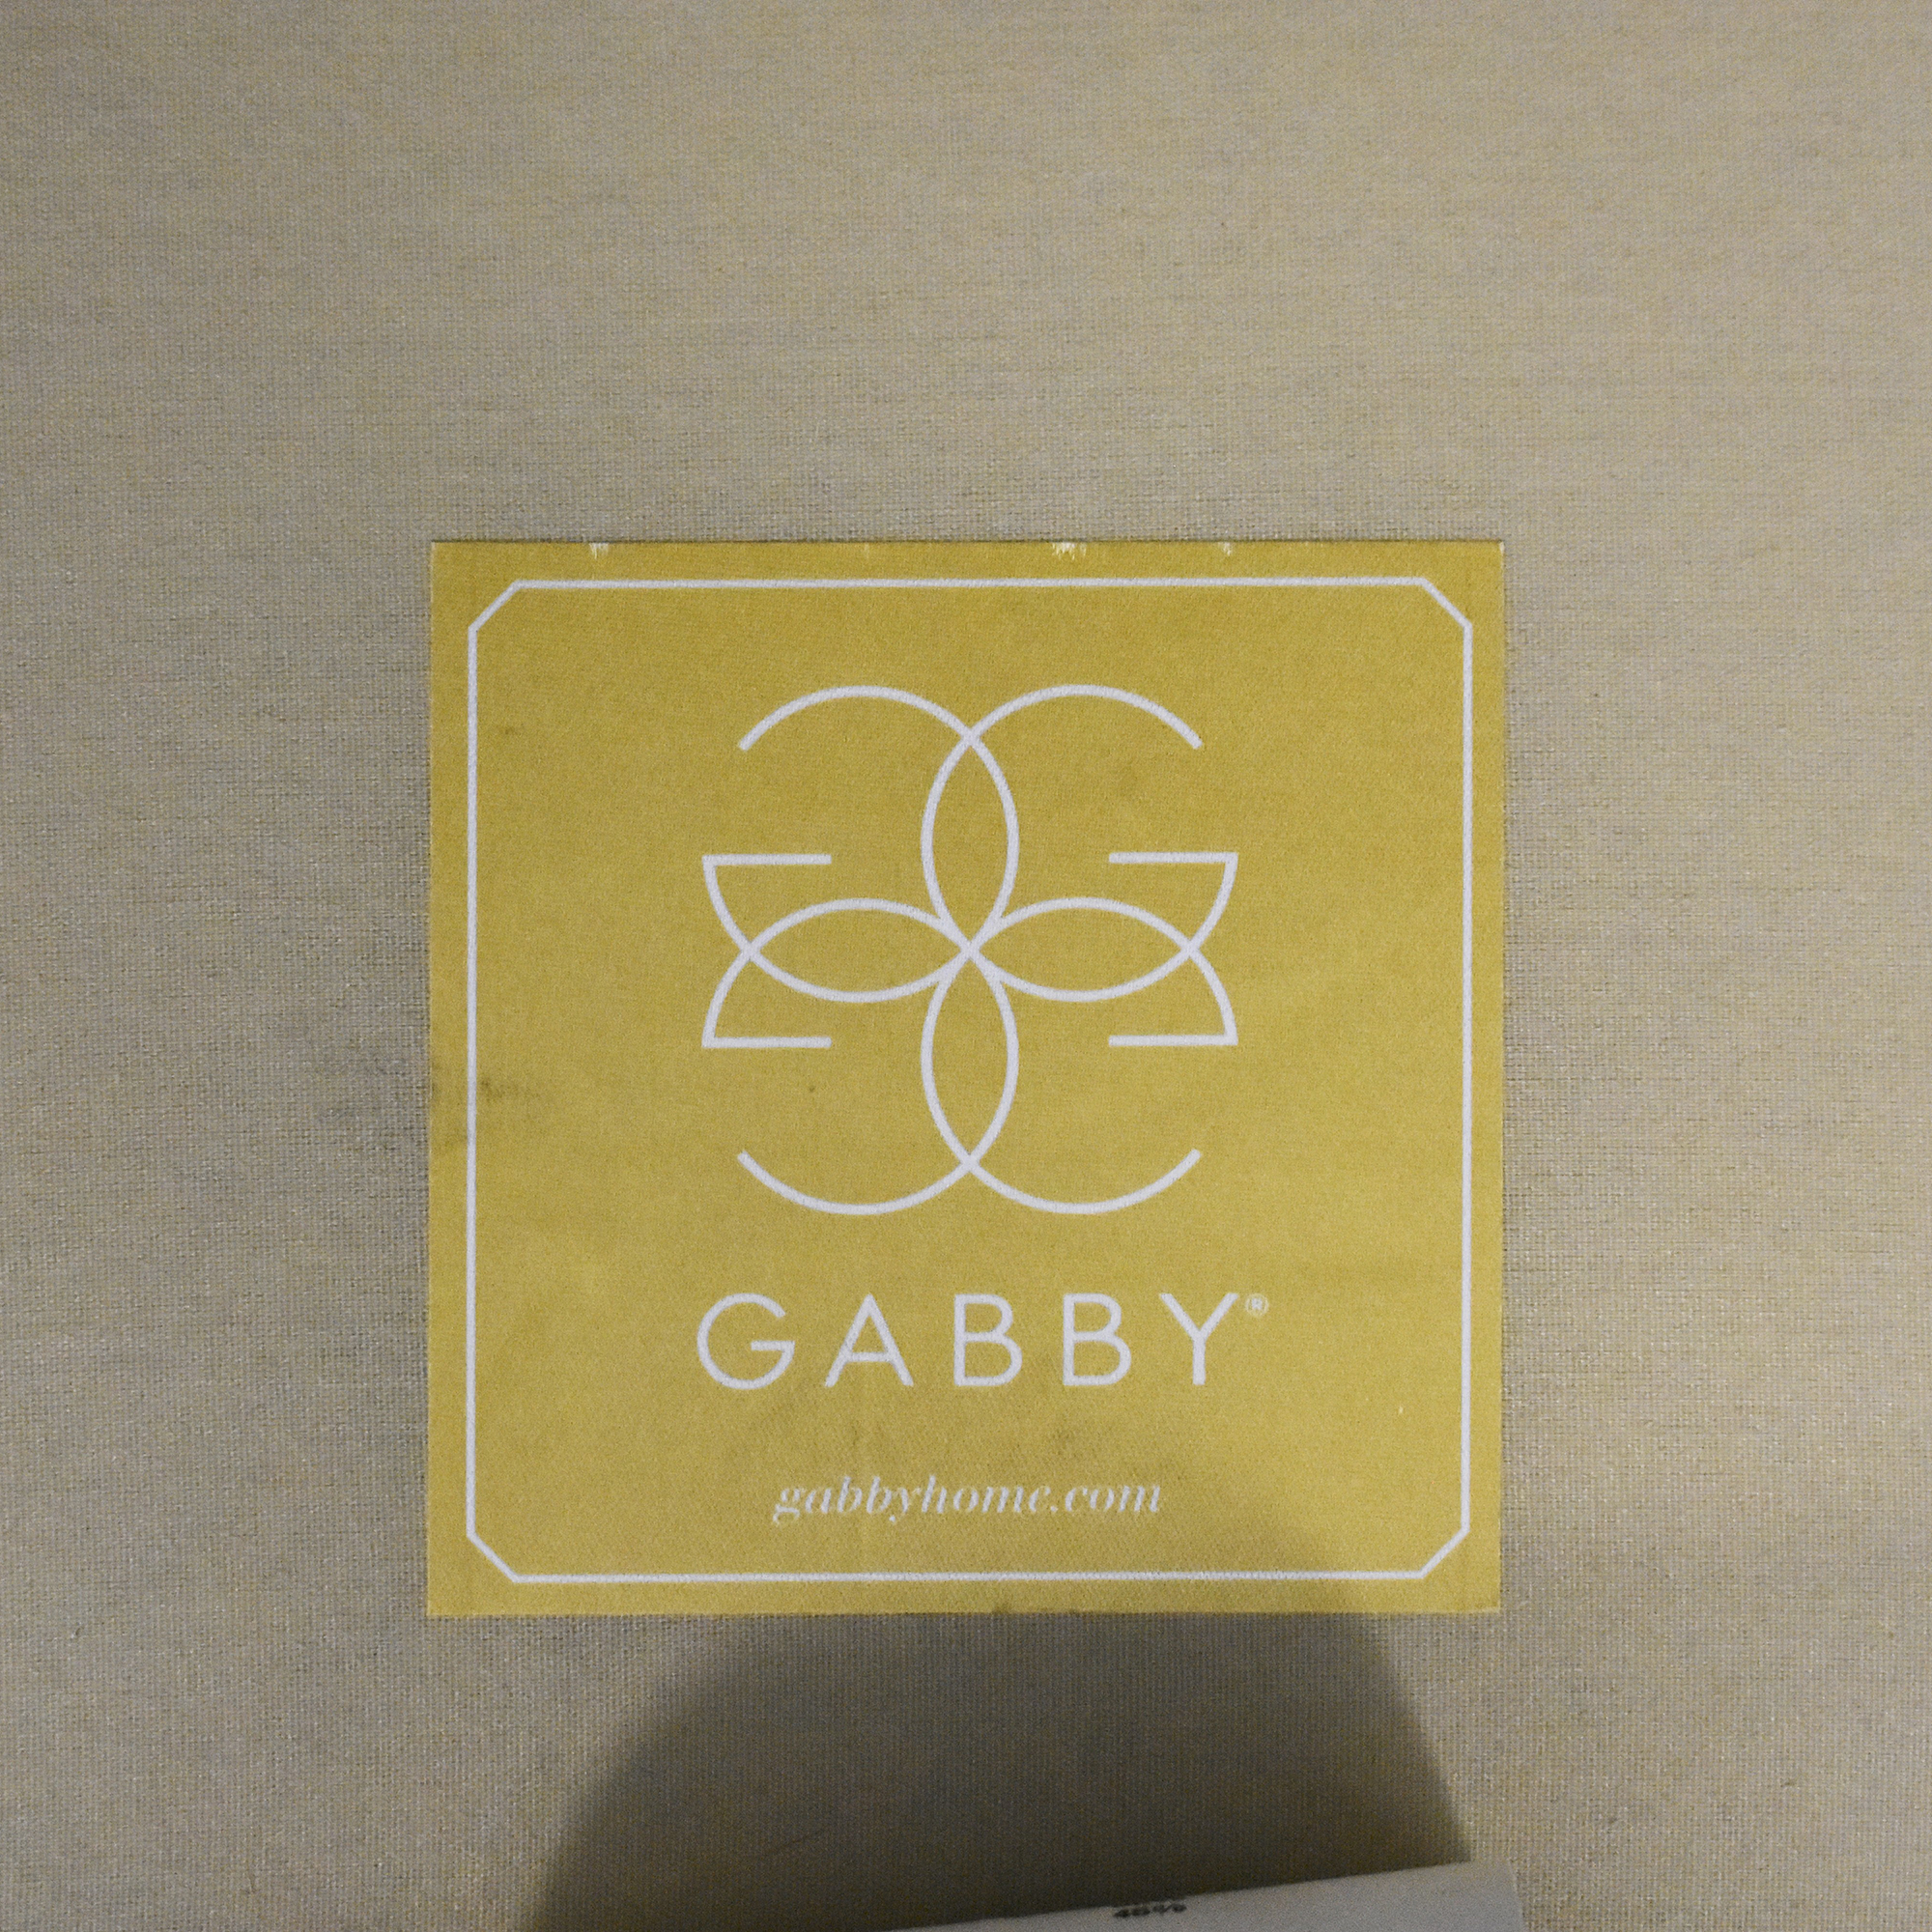 Gabby Home Gabby Home Bench Cushion Sofa pa